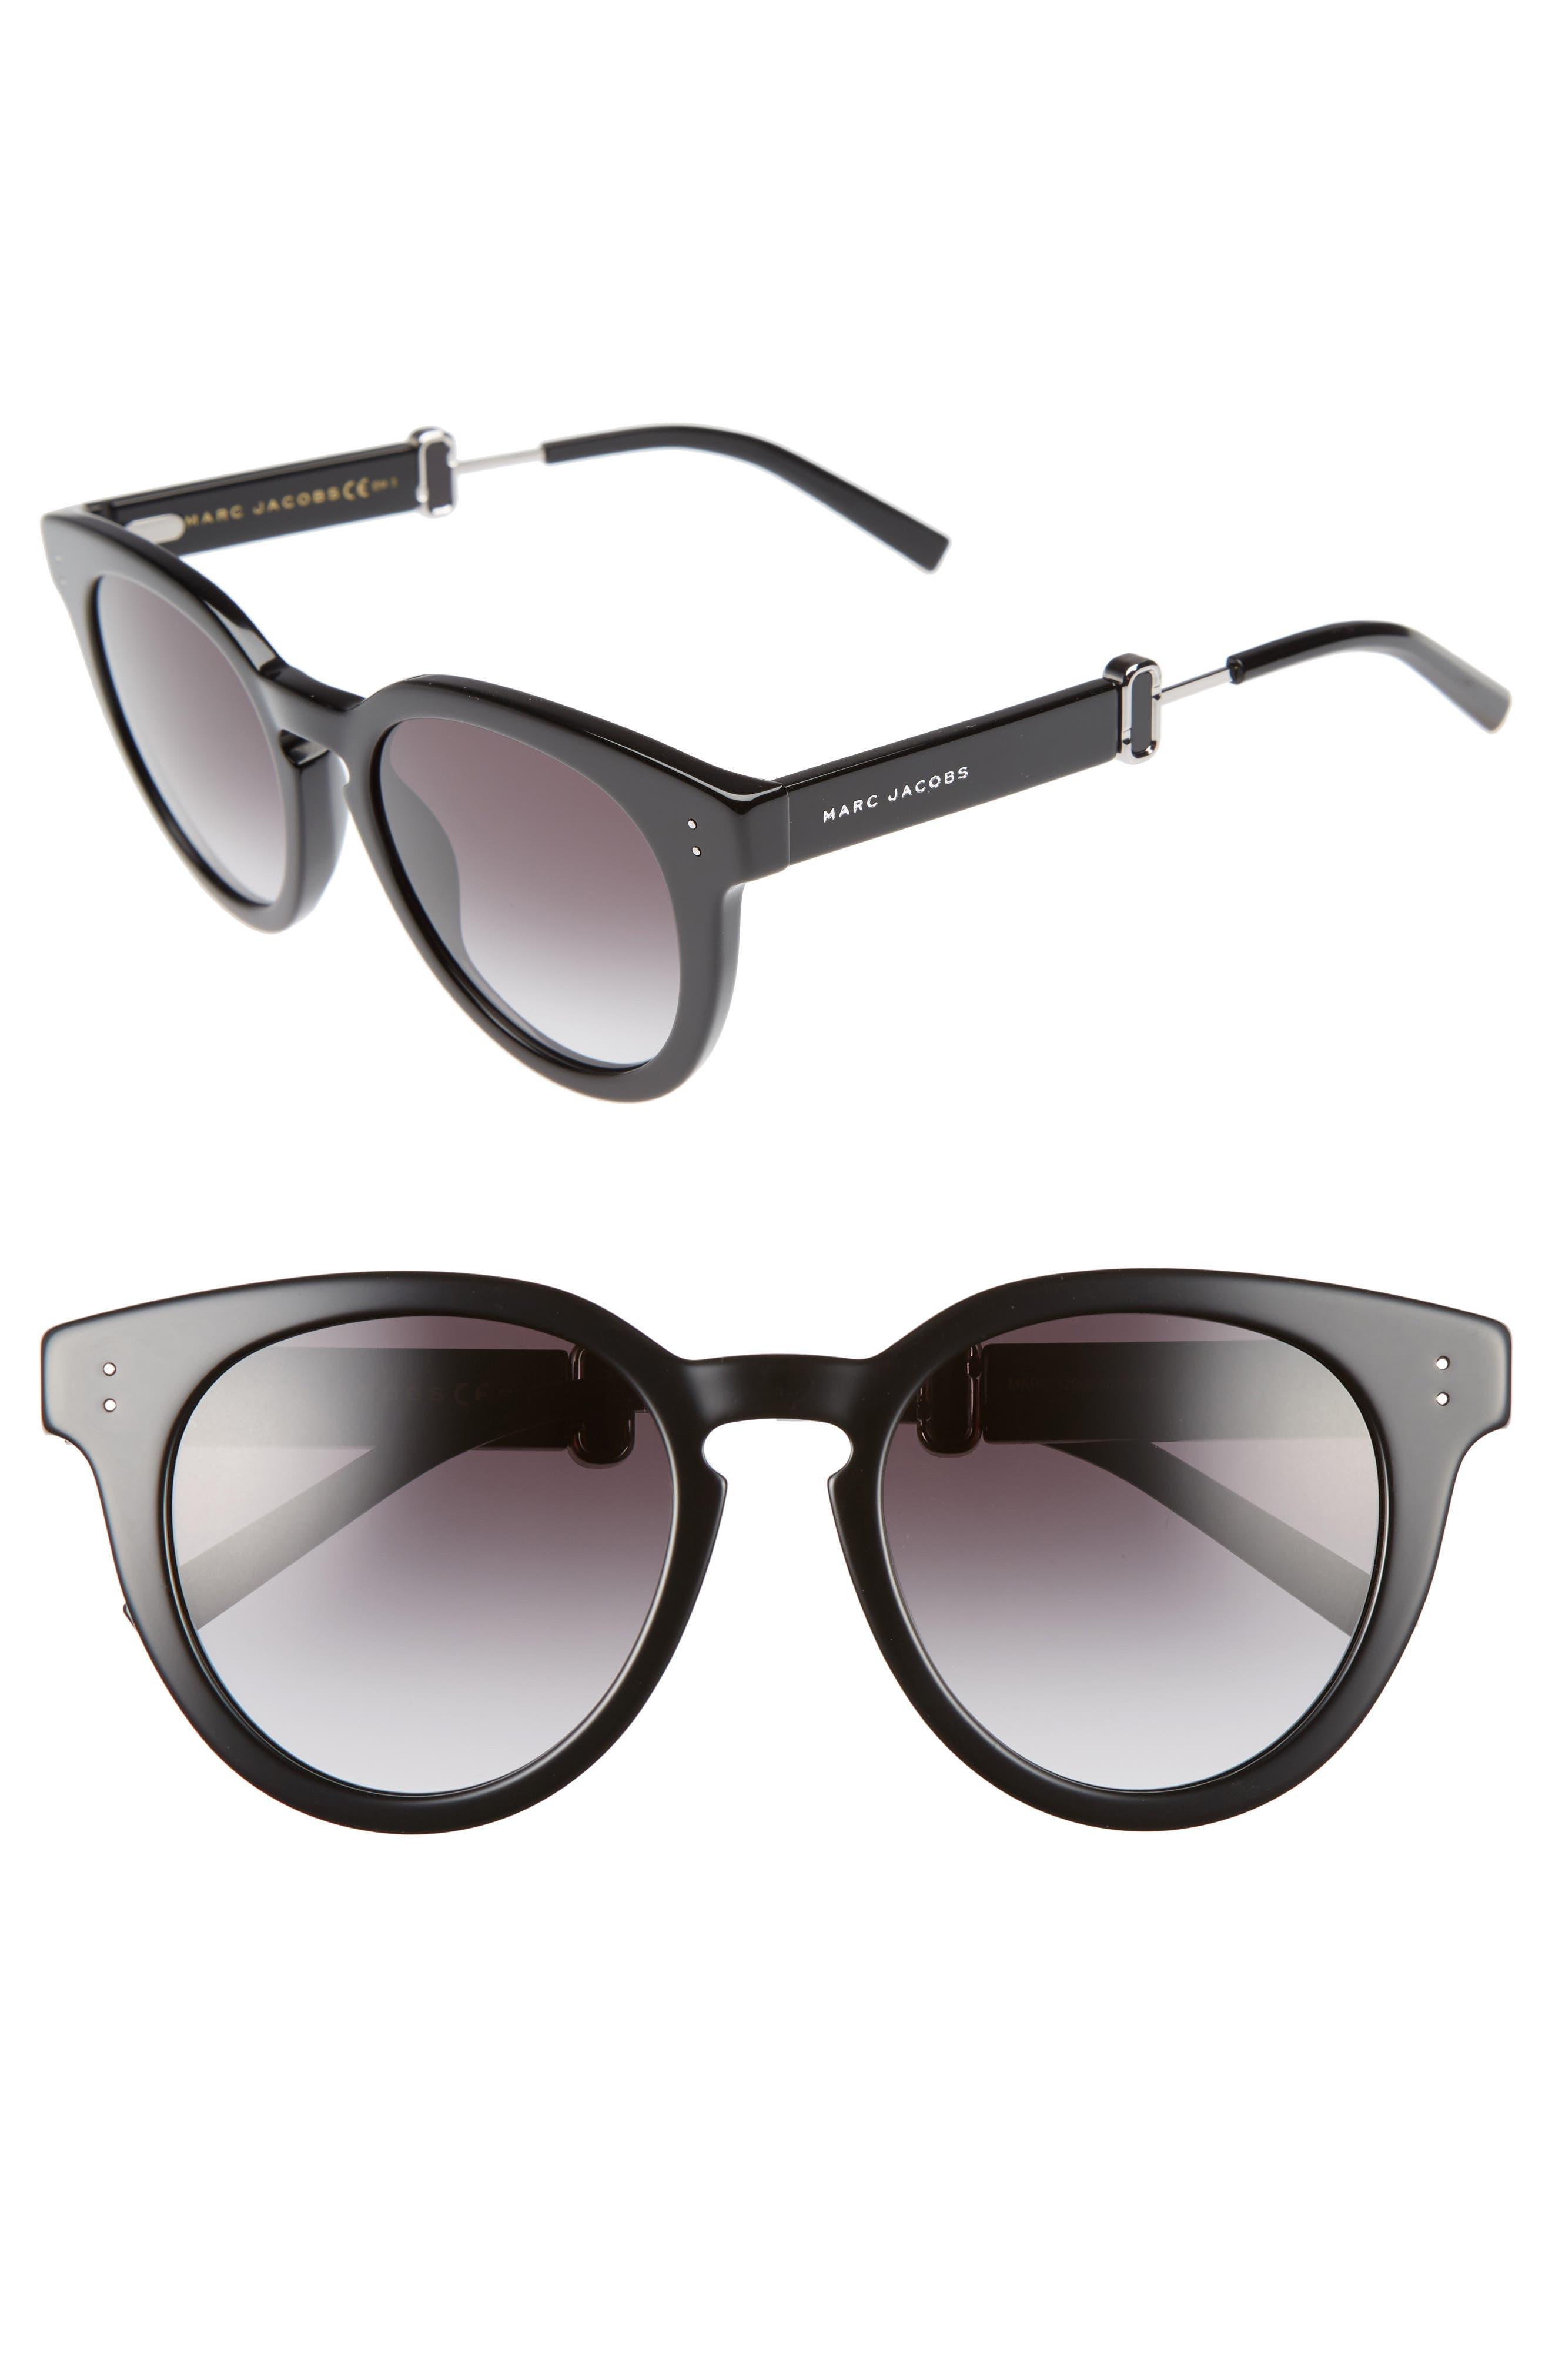 50mm Round Sunglasses,                             Alternate thumbnail 2, color,                             001